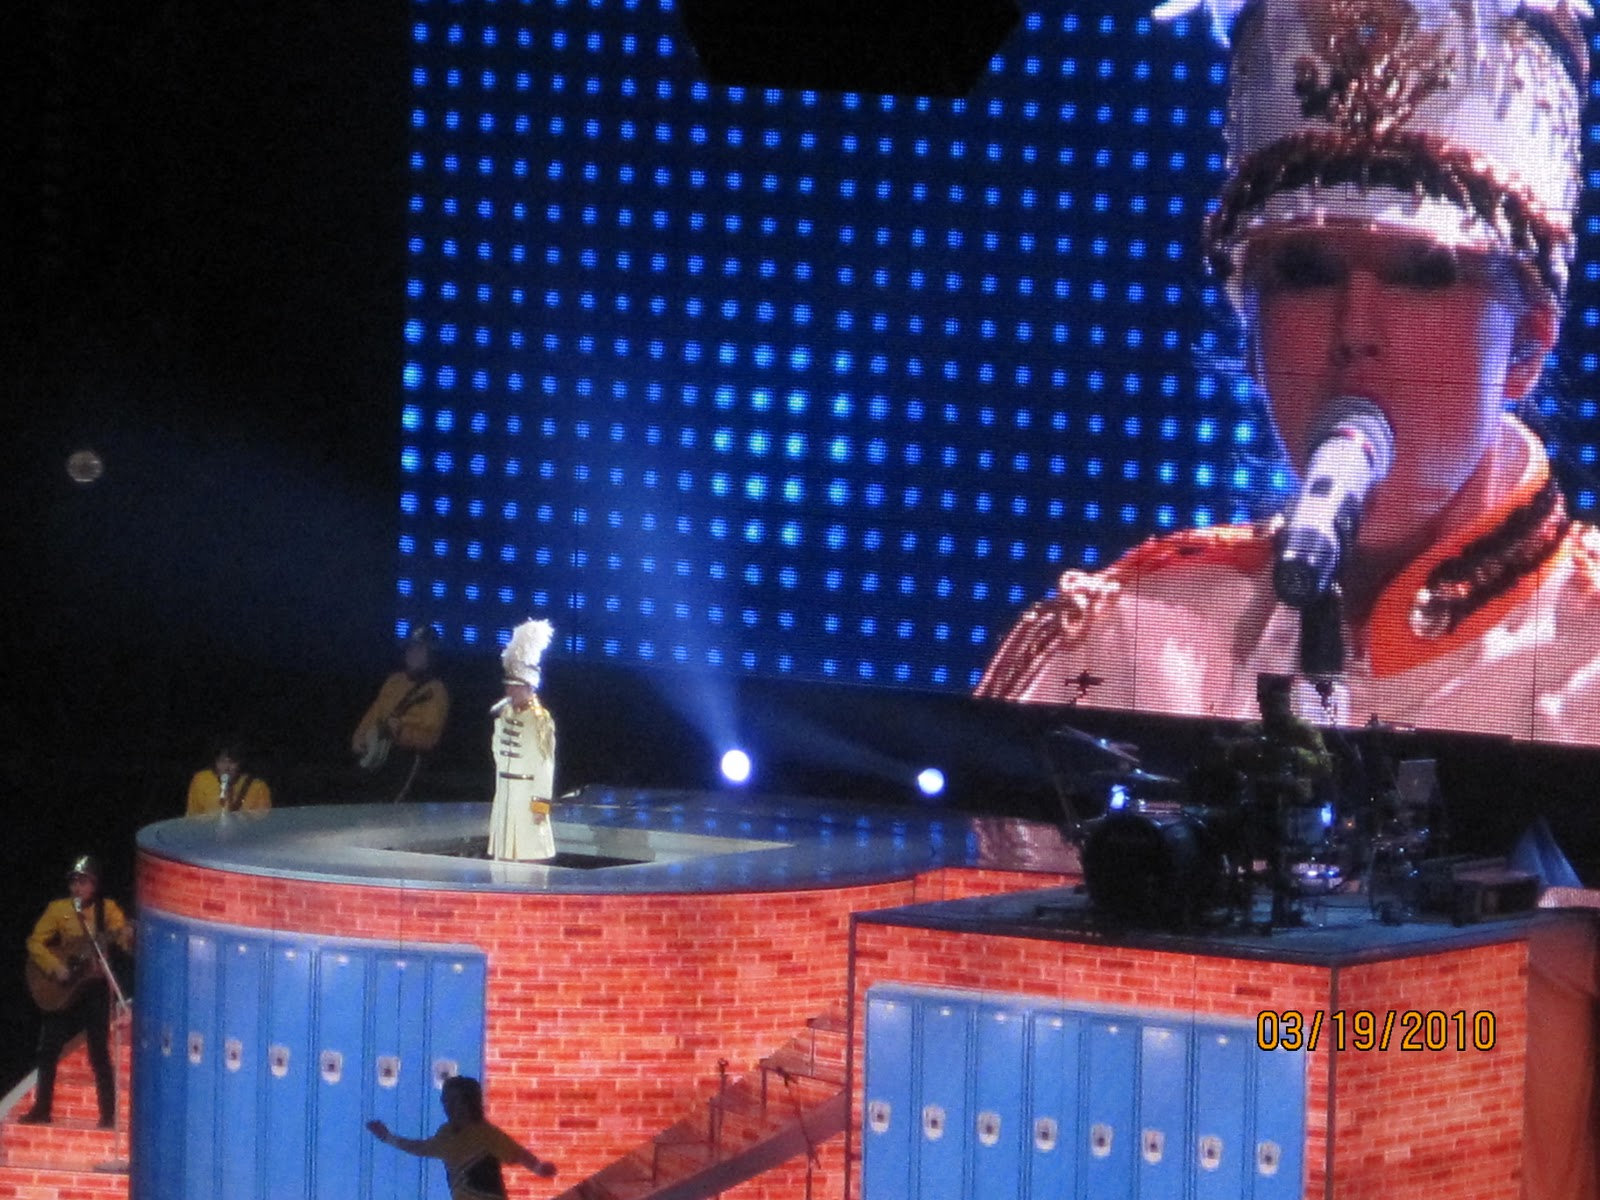 http://2.bp.blogspot.com/_zhQCIcpuWno/TMzsgrTJHgI/AAAAAAAAAr0/3hSvSrX5qIM/s1600/Taylor+Swift+Concert+038.jpg